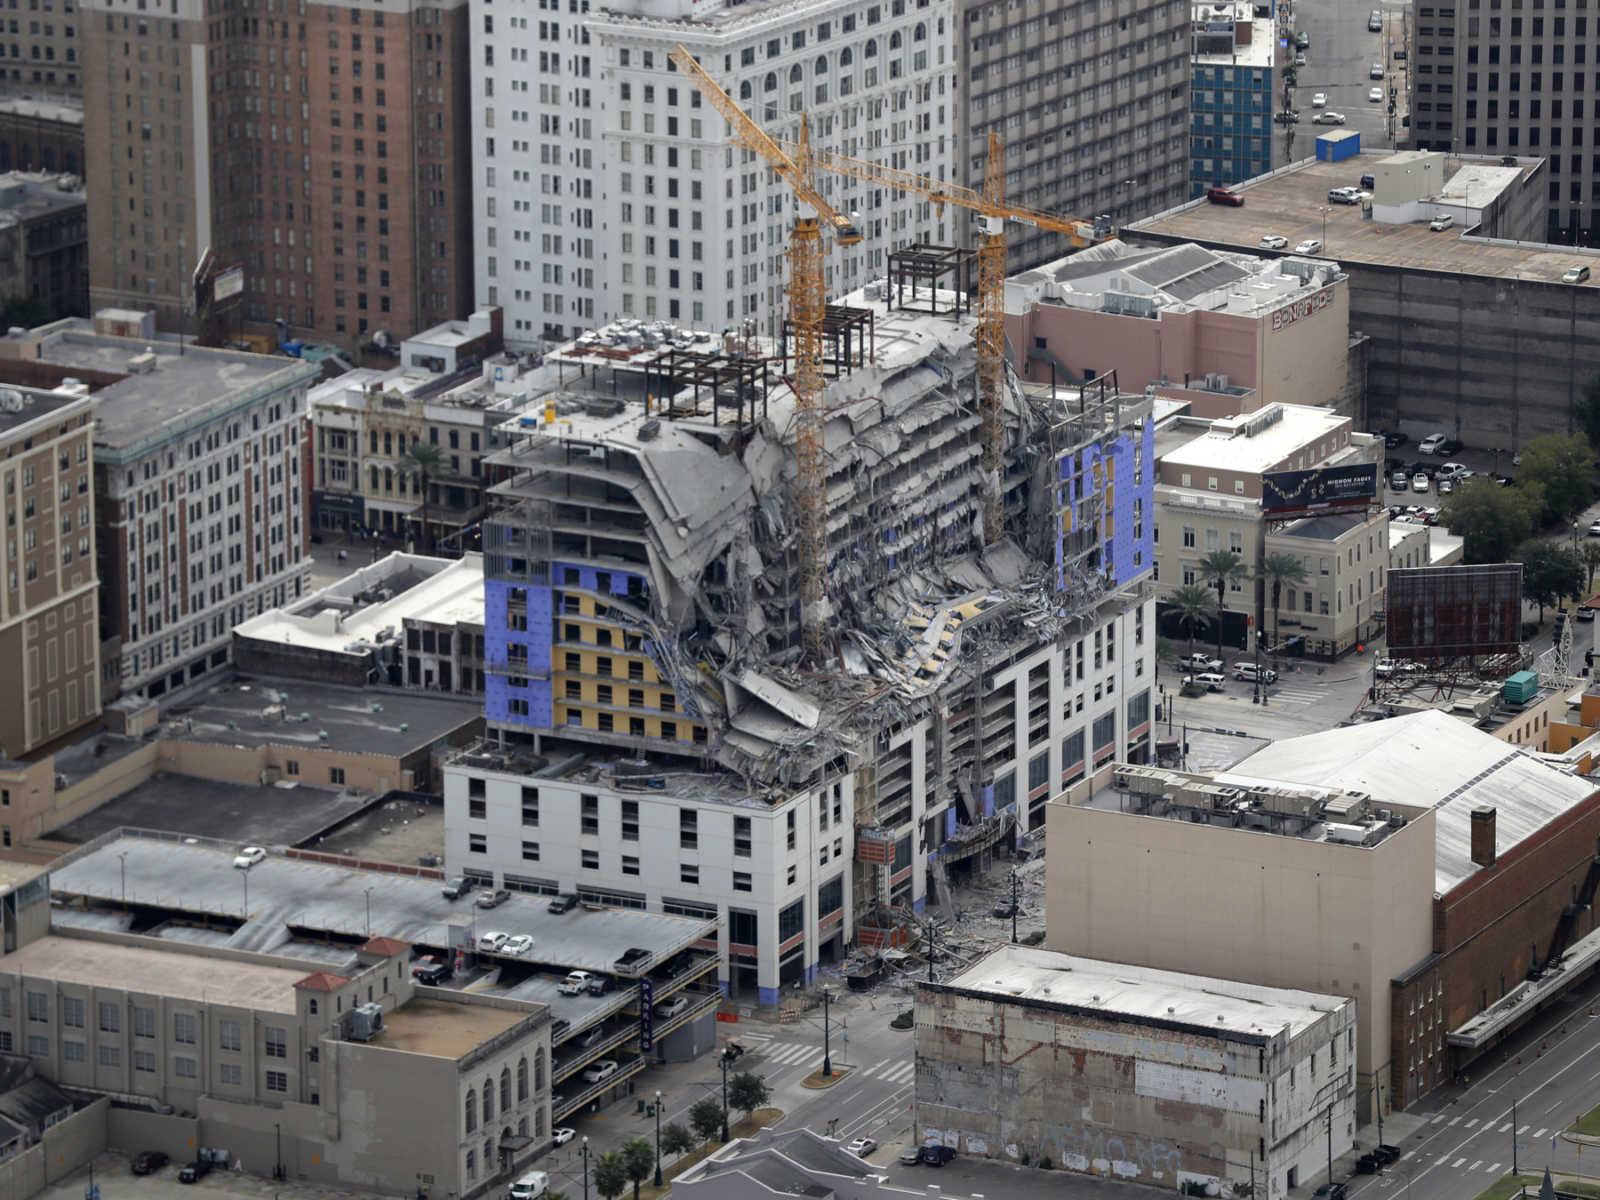 Hard Rock Hotel collapse